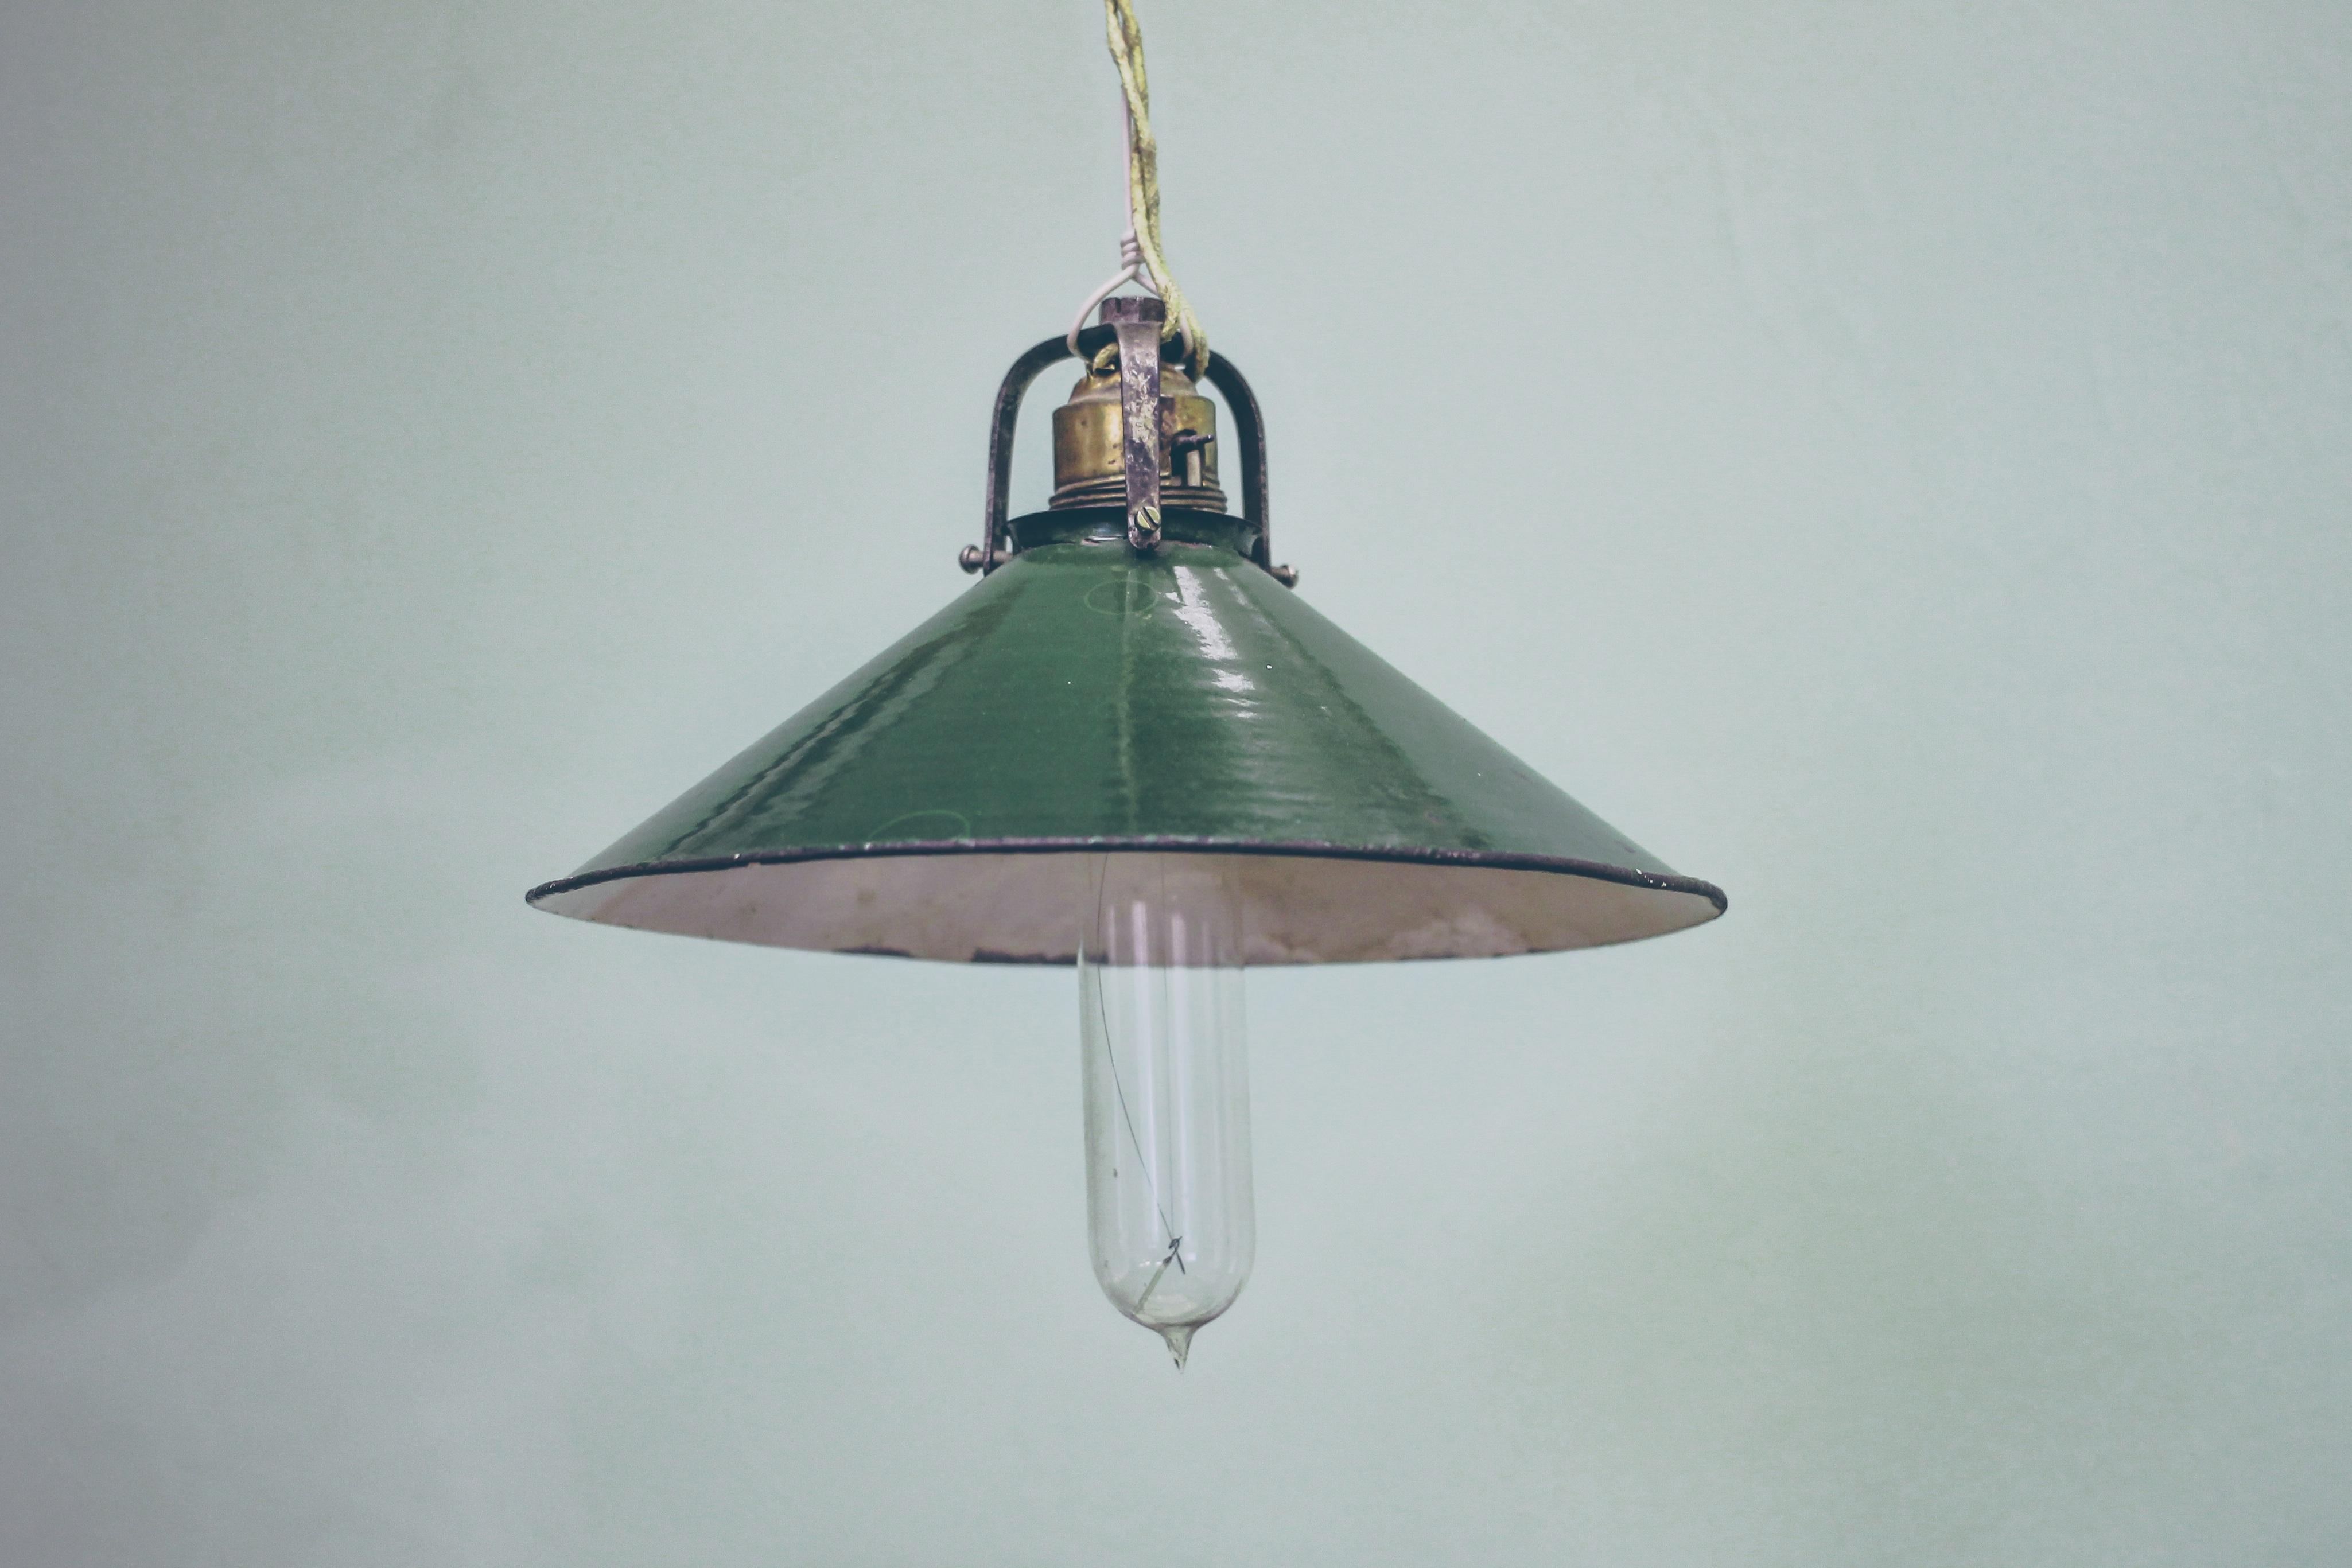 Free images ceiling bulb lamp lighting decor light fixture light ceiling bulb lamp lighting decor light fixture chandelier sconce arubaitofo Gallery